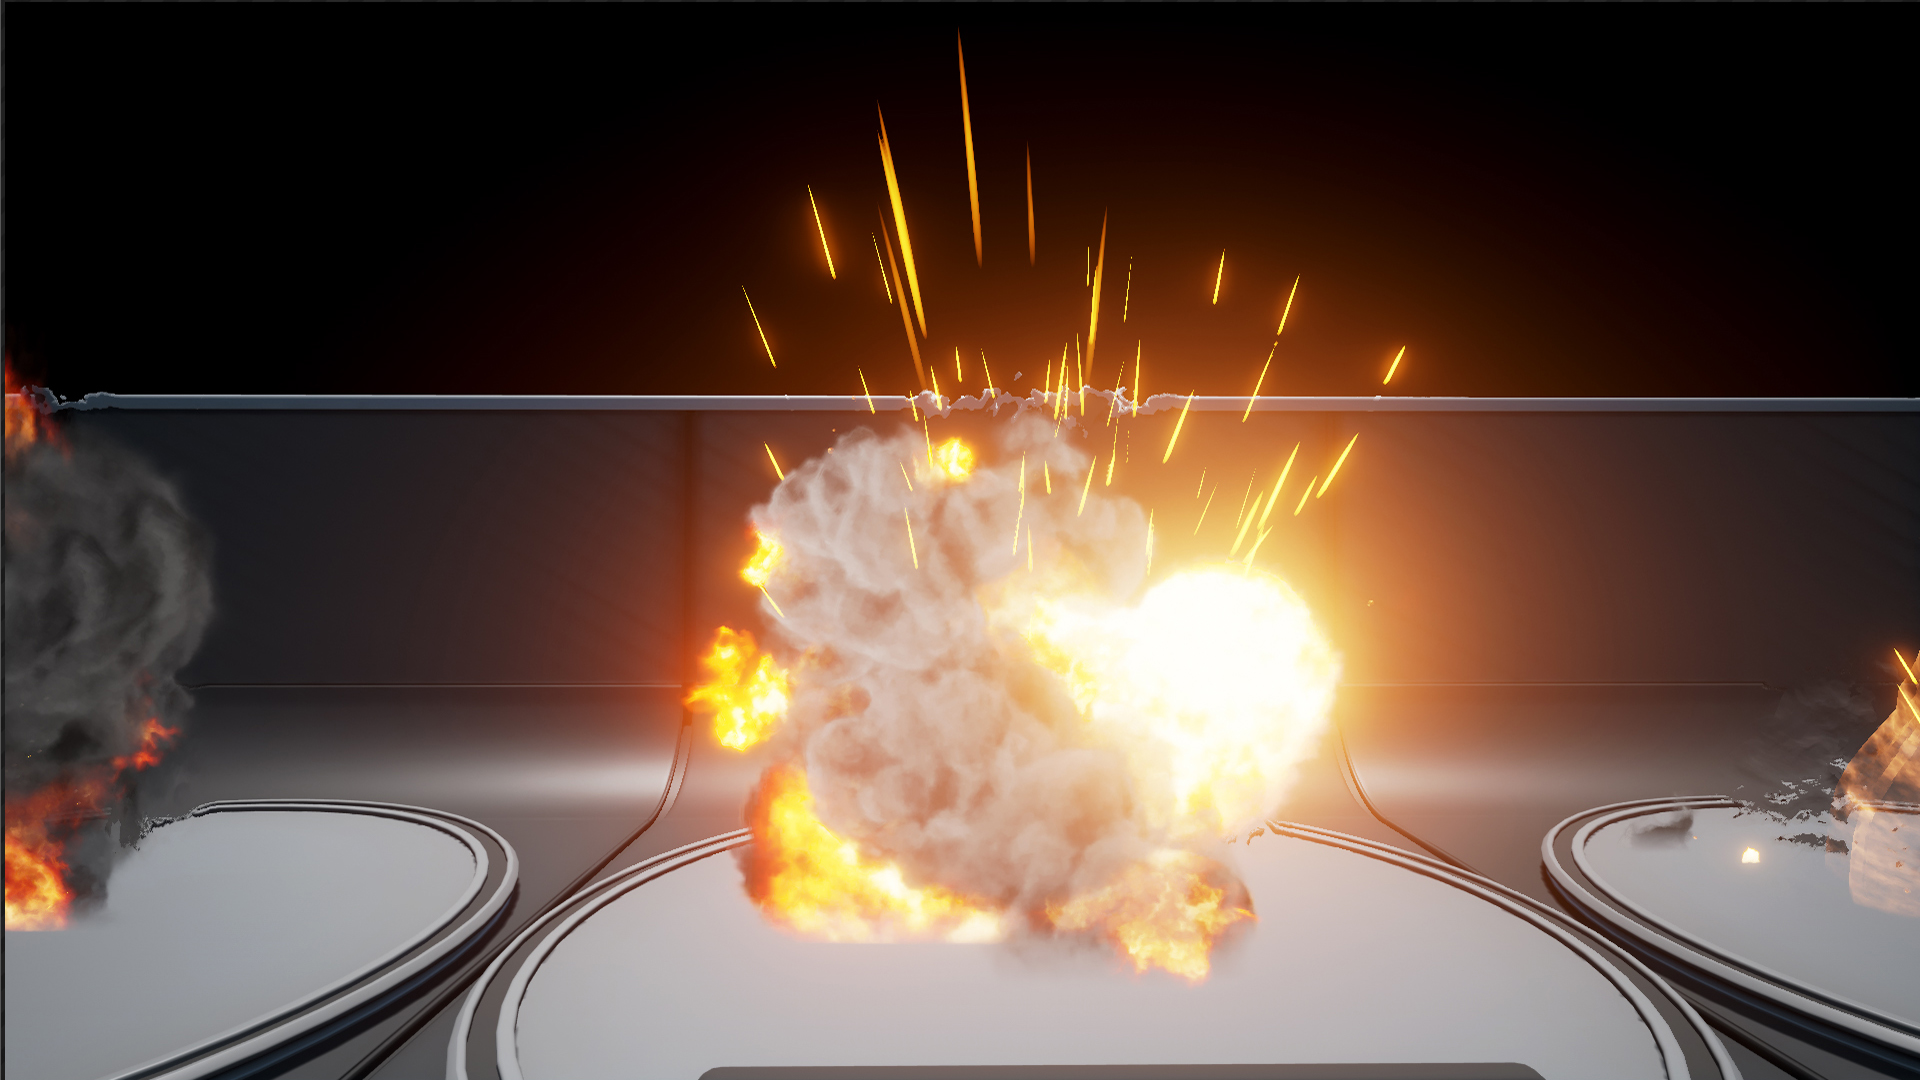 Explosions Builder